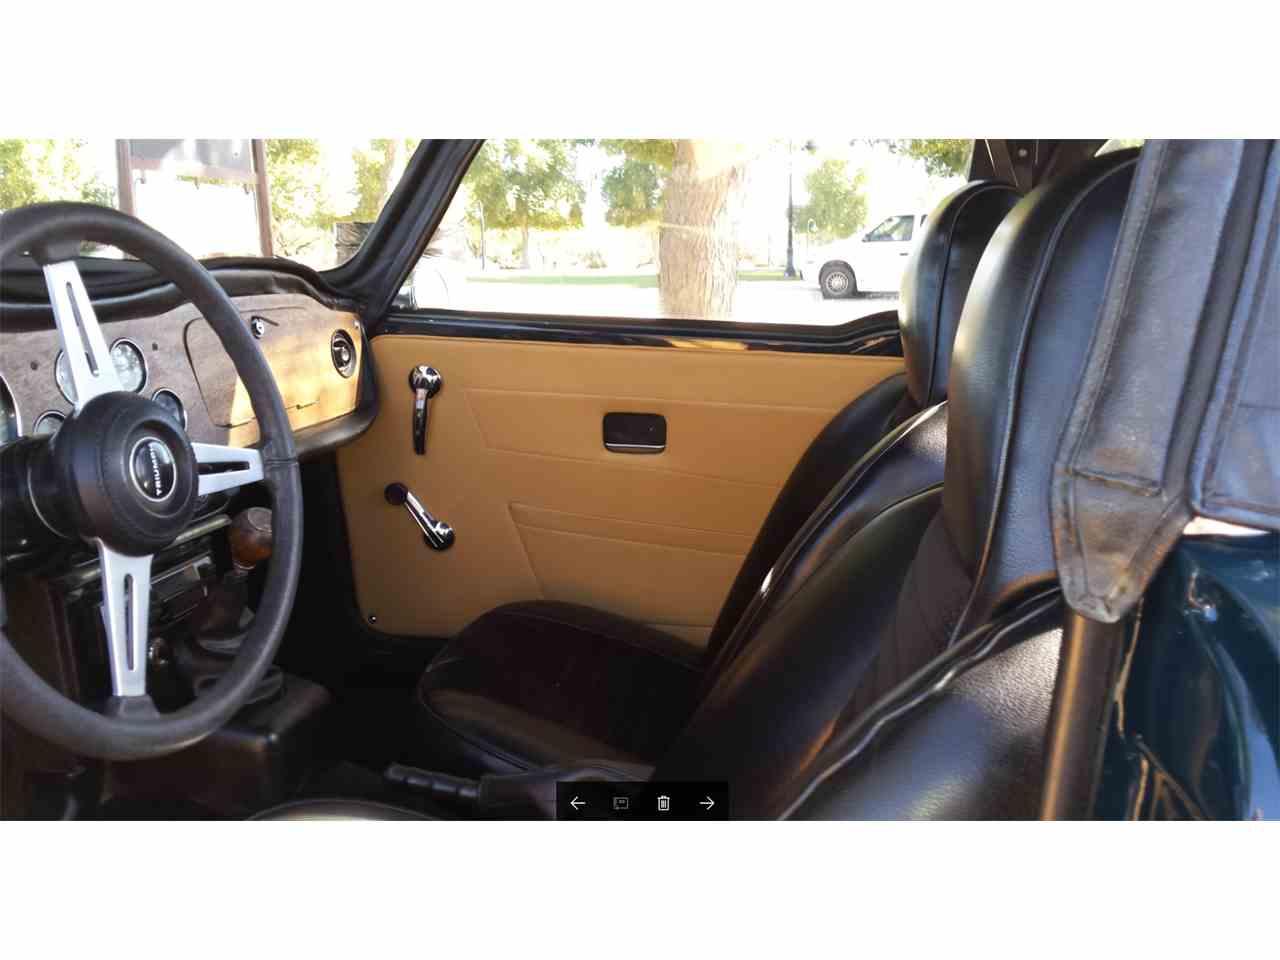 Large Picture of 1974 Triumph TR6 located in Arizona - $22,500.00 - JUCJ